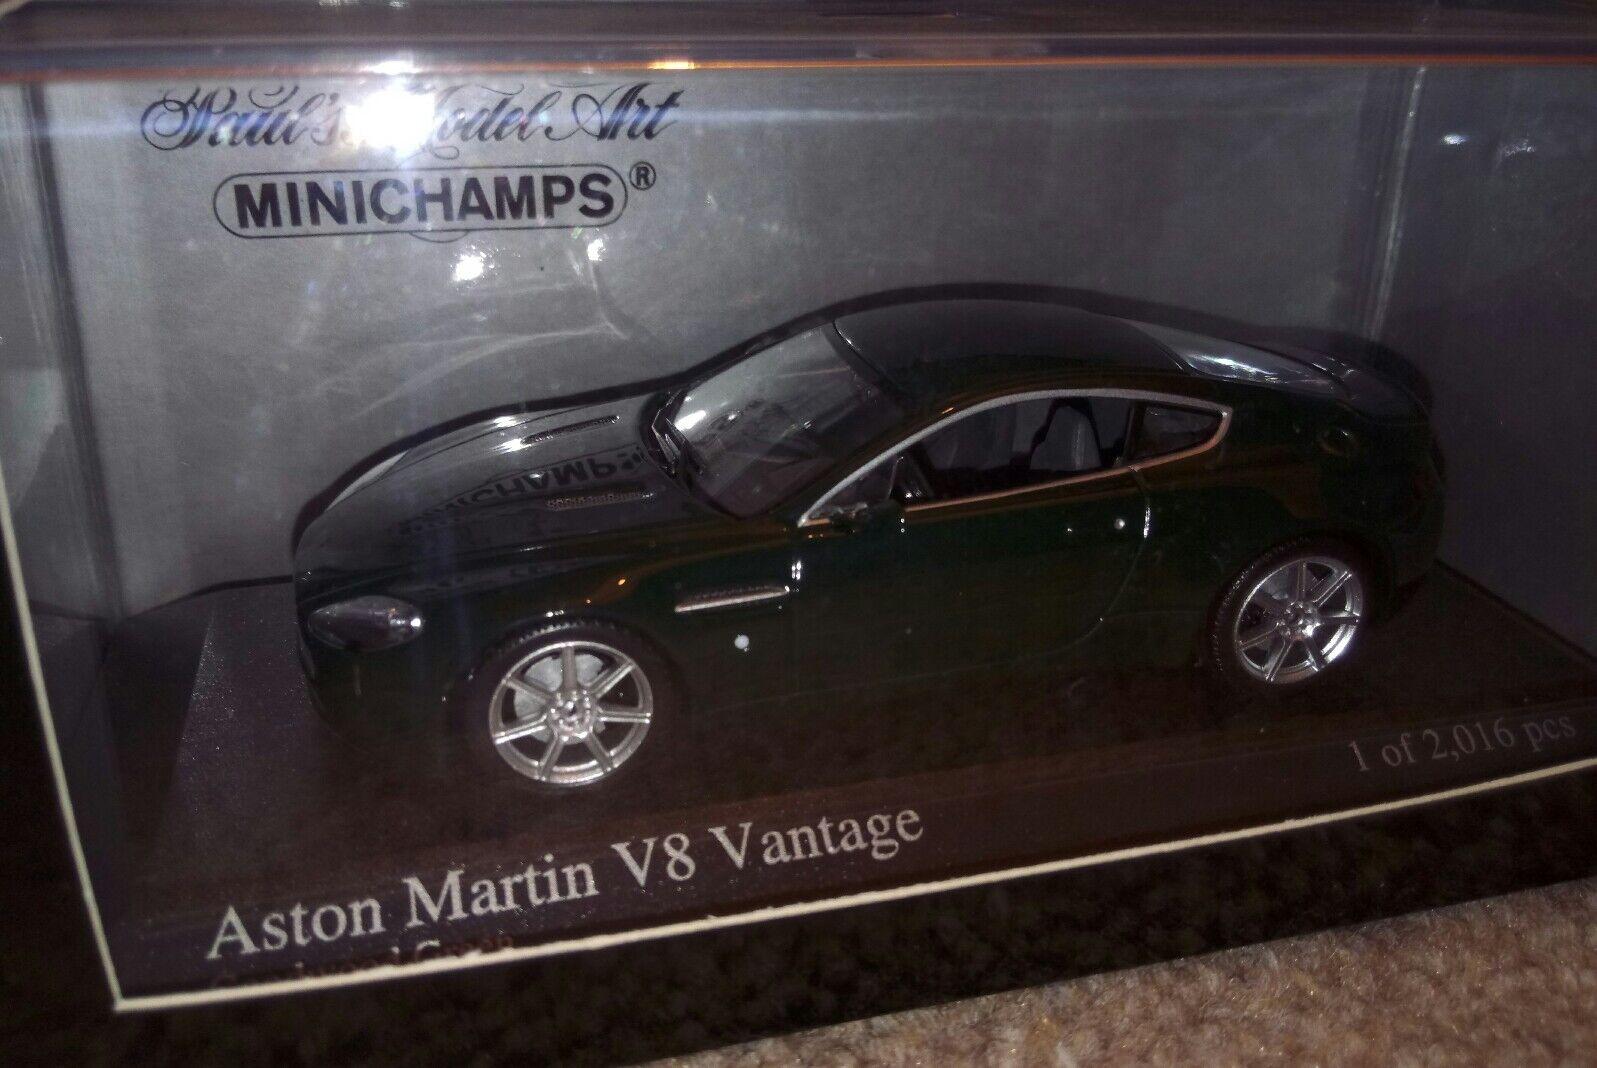 Rare Aston Martin Vantage Good wood Green Ltd 1 43 scale MIB by Minichamps